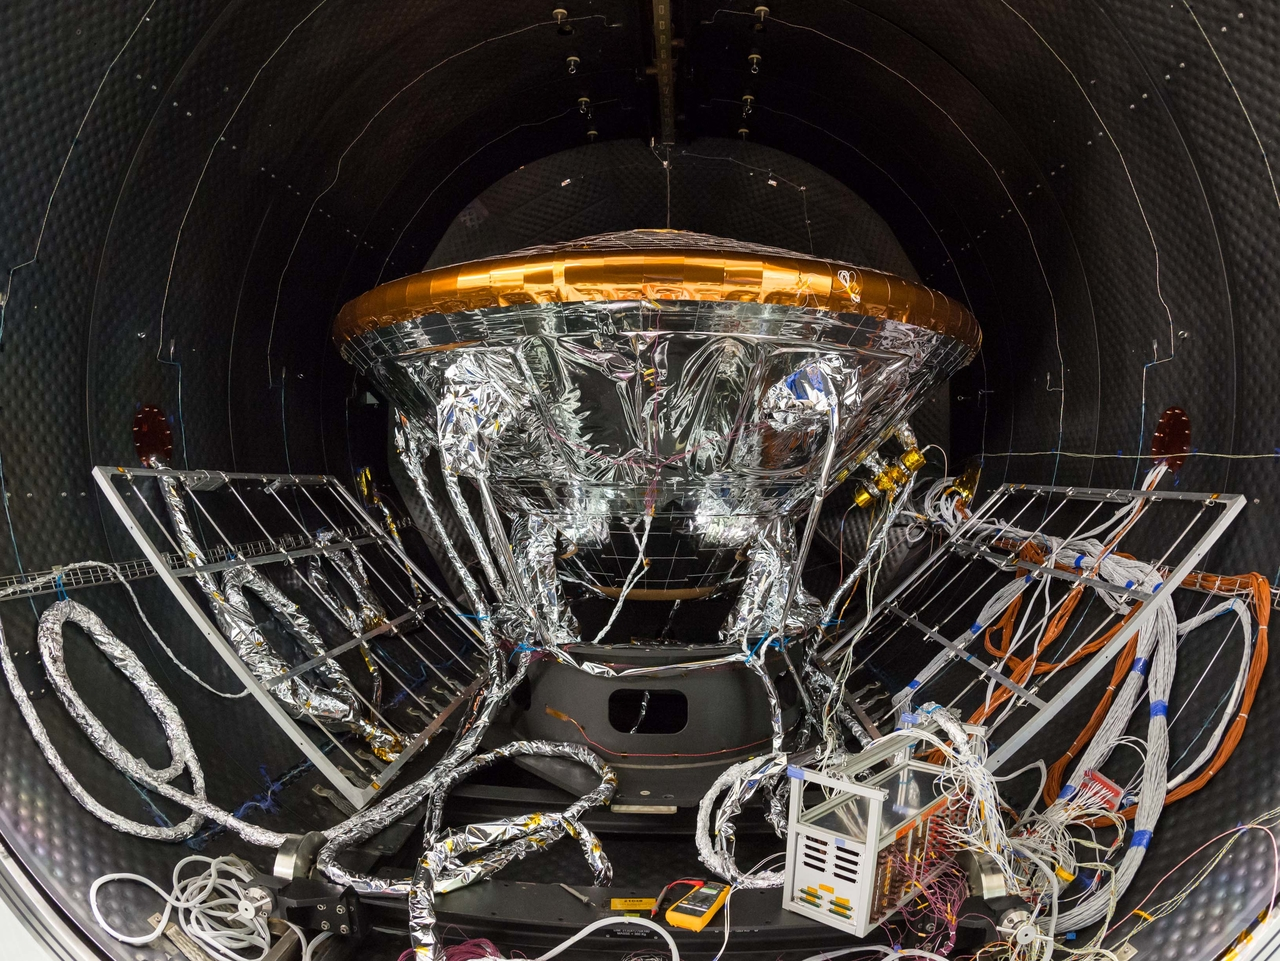 ExoMars' Schiaparelli Lander Model Tests